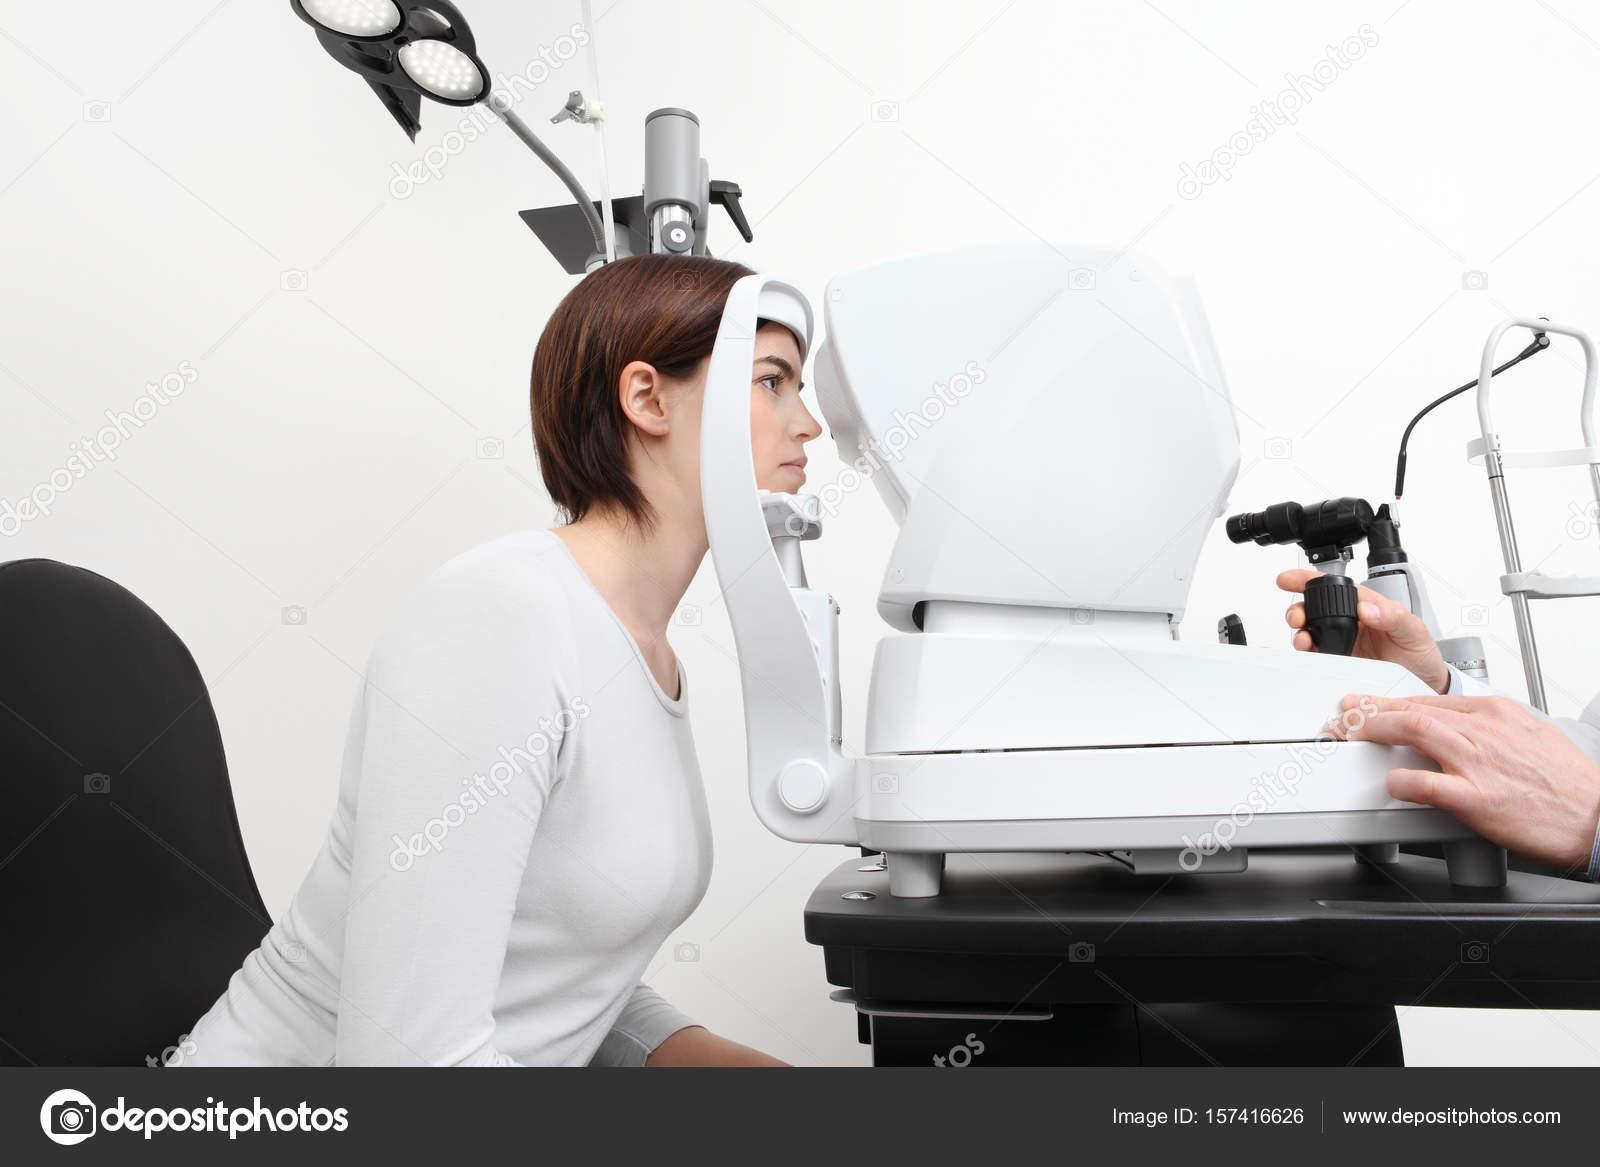 7b5373ec1f γυναίκα κάνει μέτρηση όραση με οπτικό σχισμοειδή λυχνία — Φωτογραφία ...